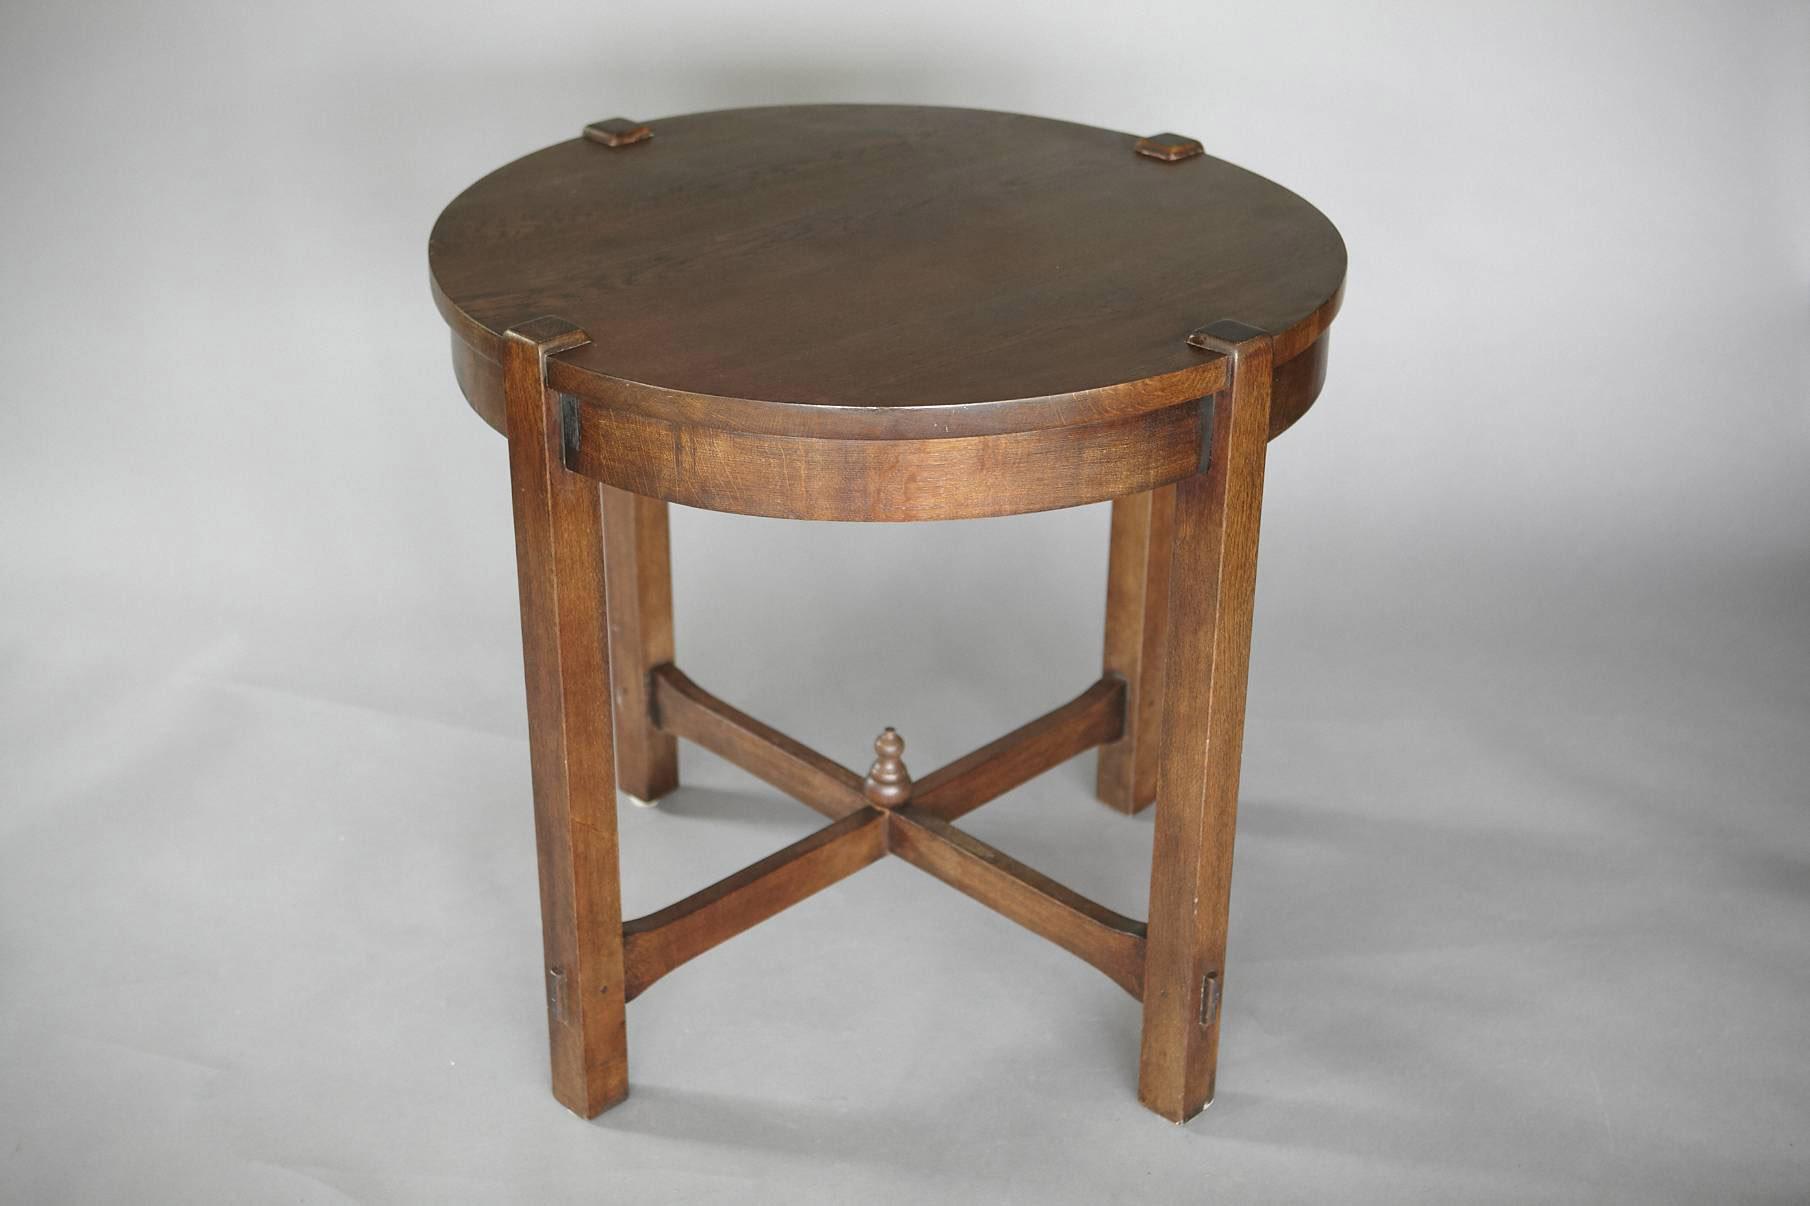 Antique oak arts crafts oak lamp table jens buettner design series0415 artsandcrafts round lamp table copy02 mg8786g geotapseo Choice Image